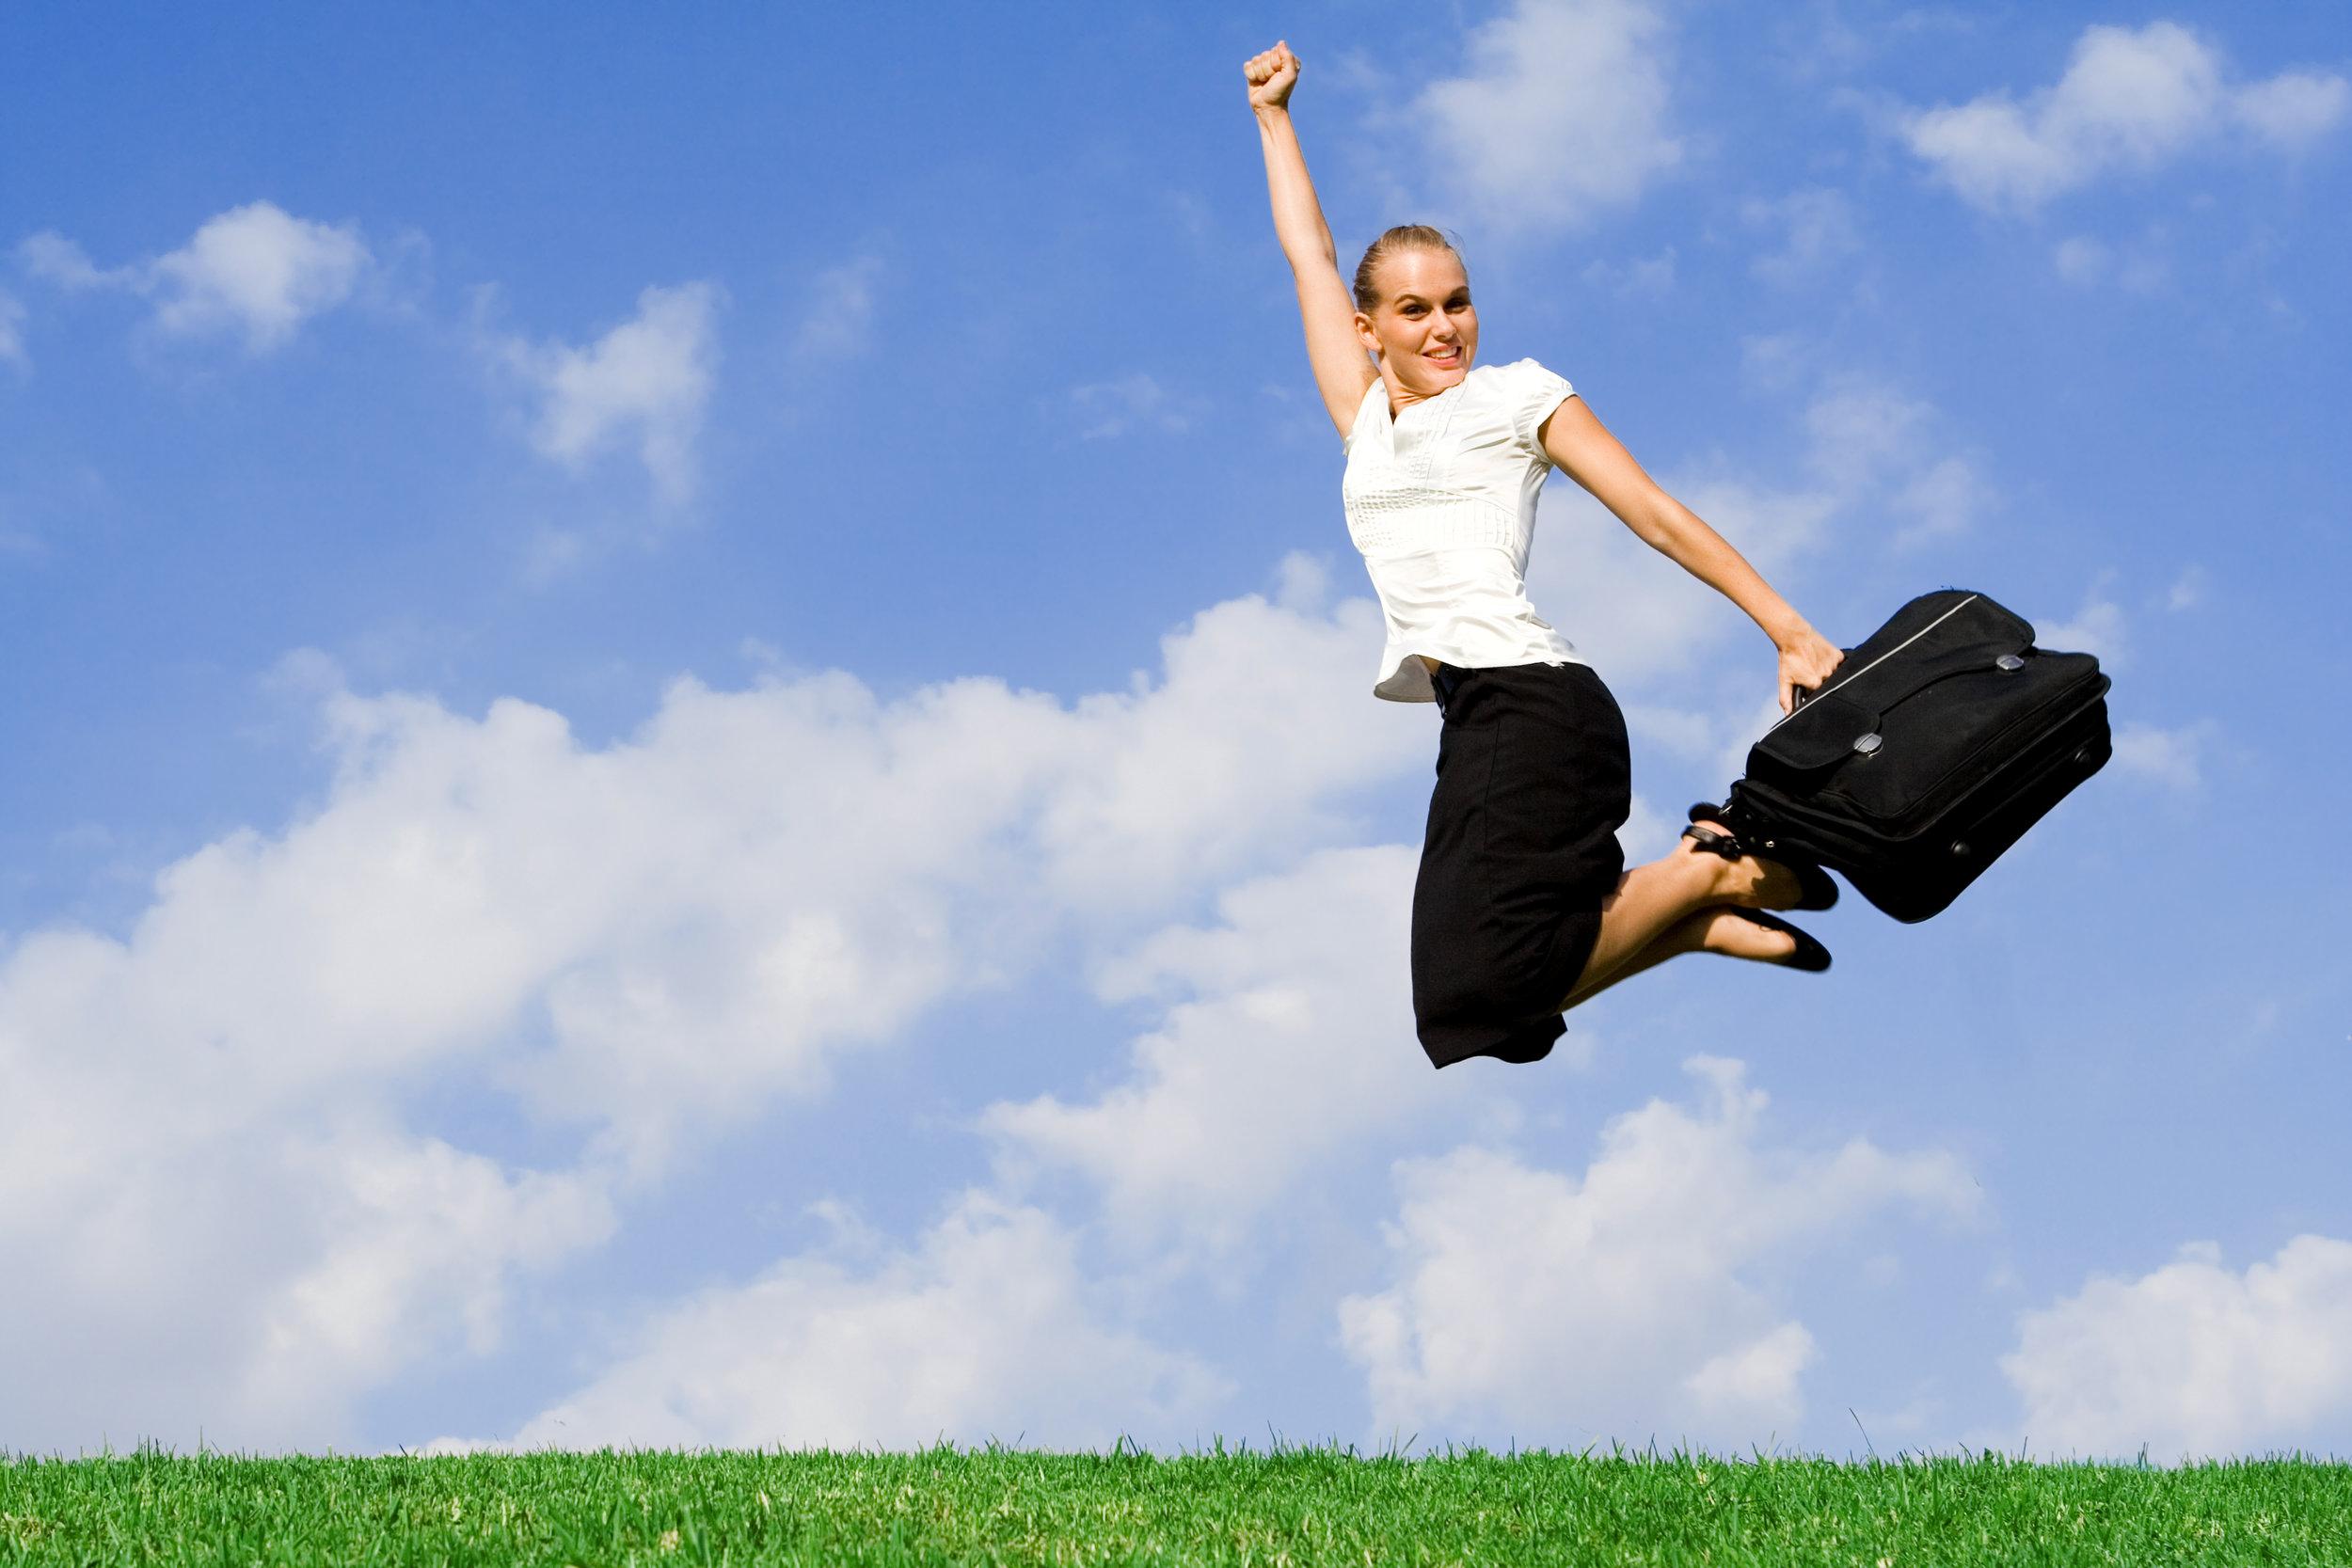 bigstock-Happy-Woman-Jumping-3660021.jpg